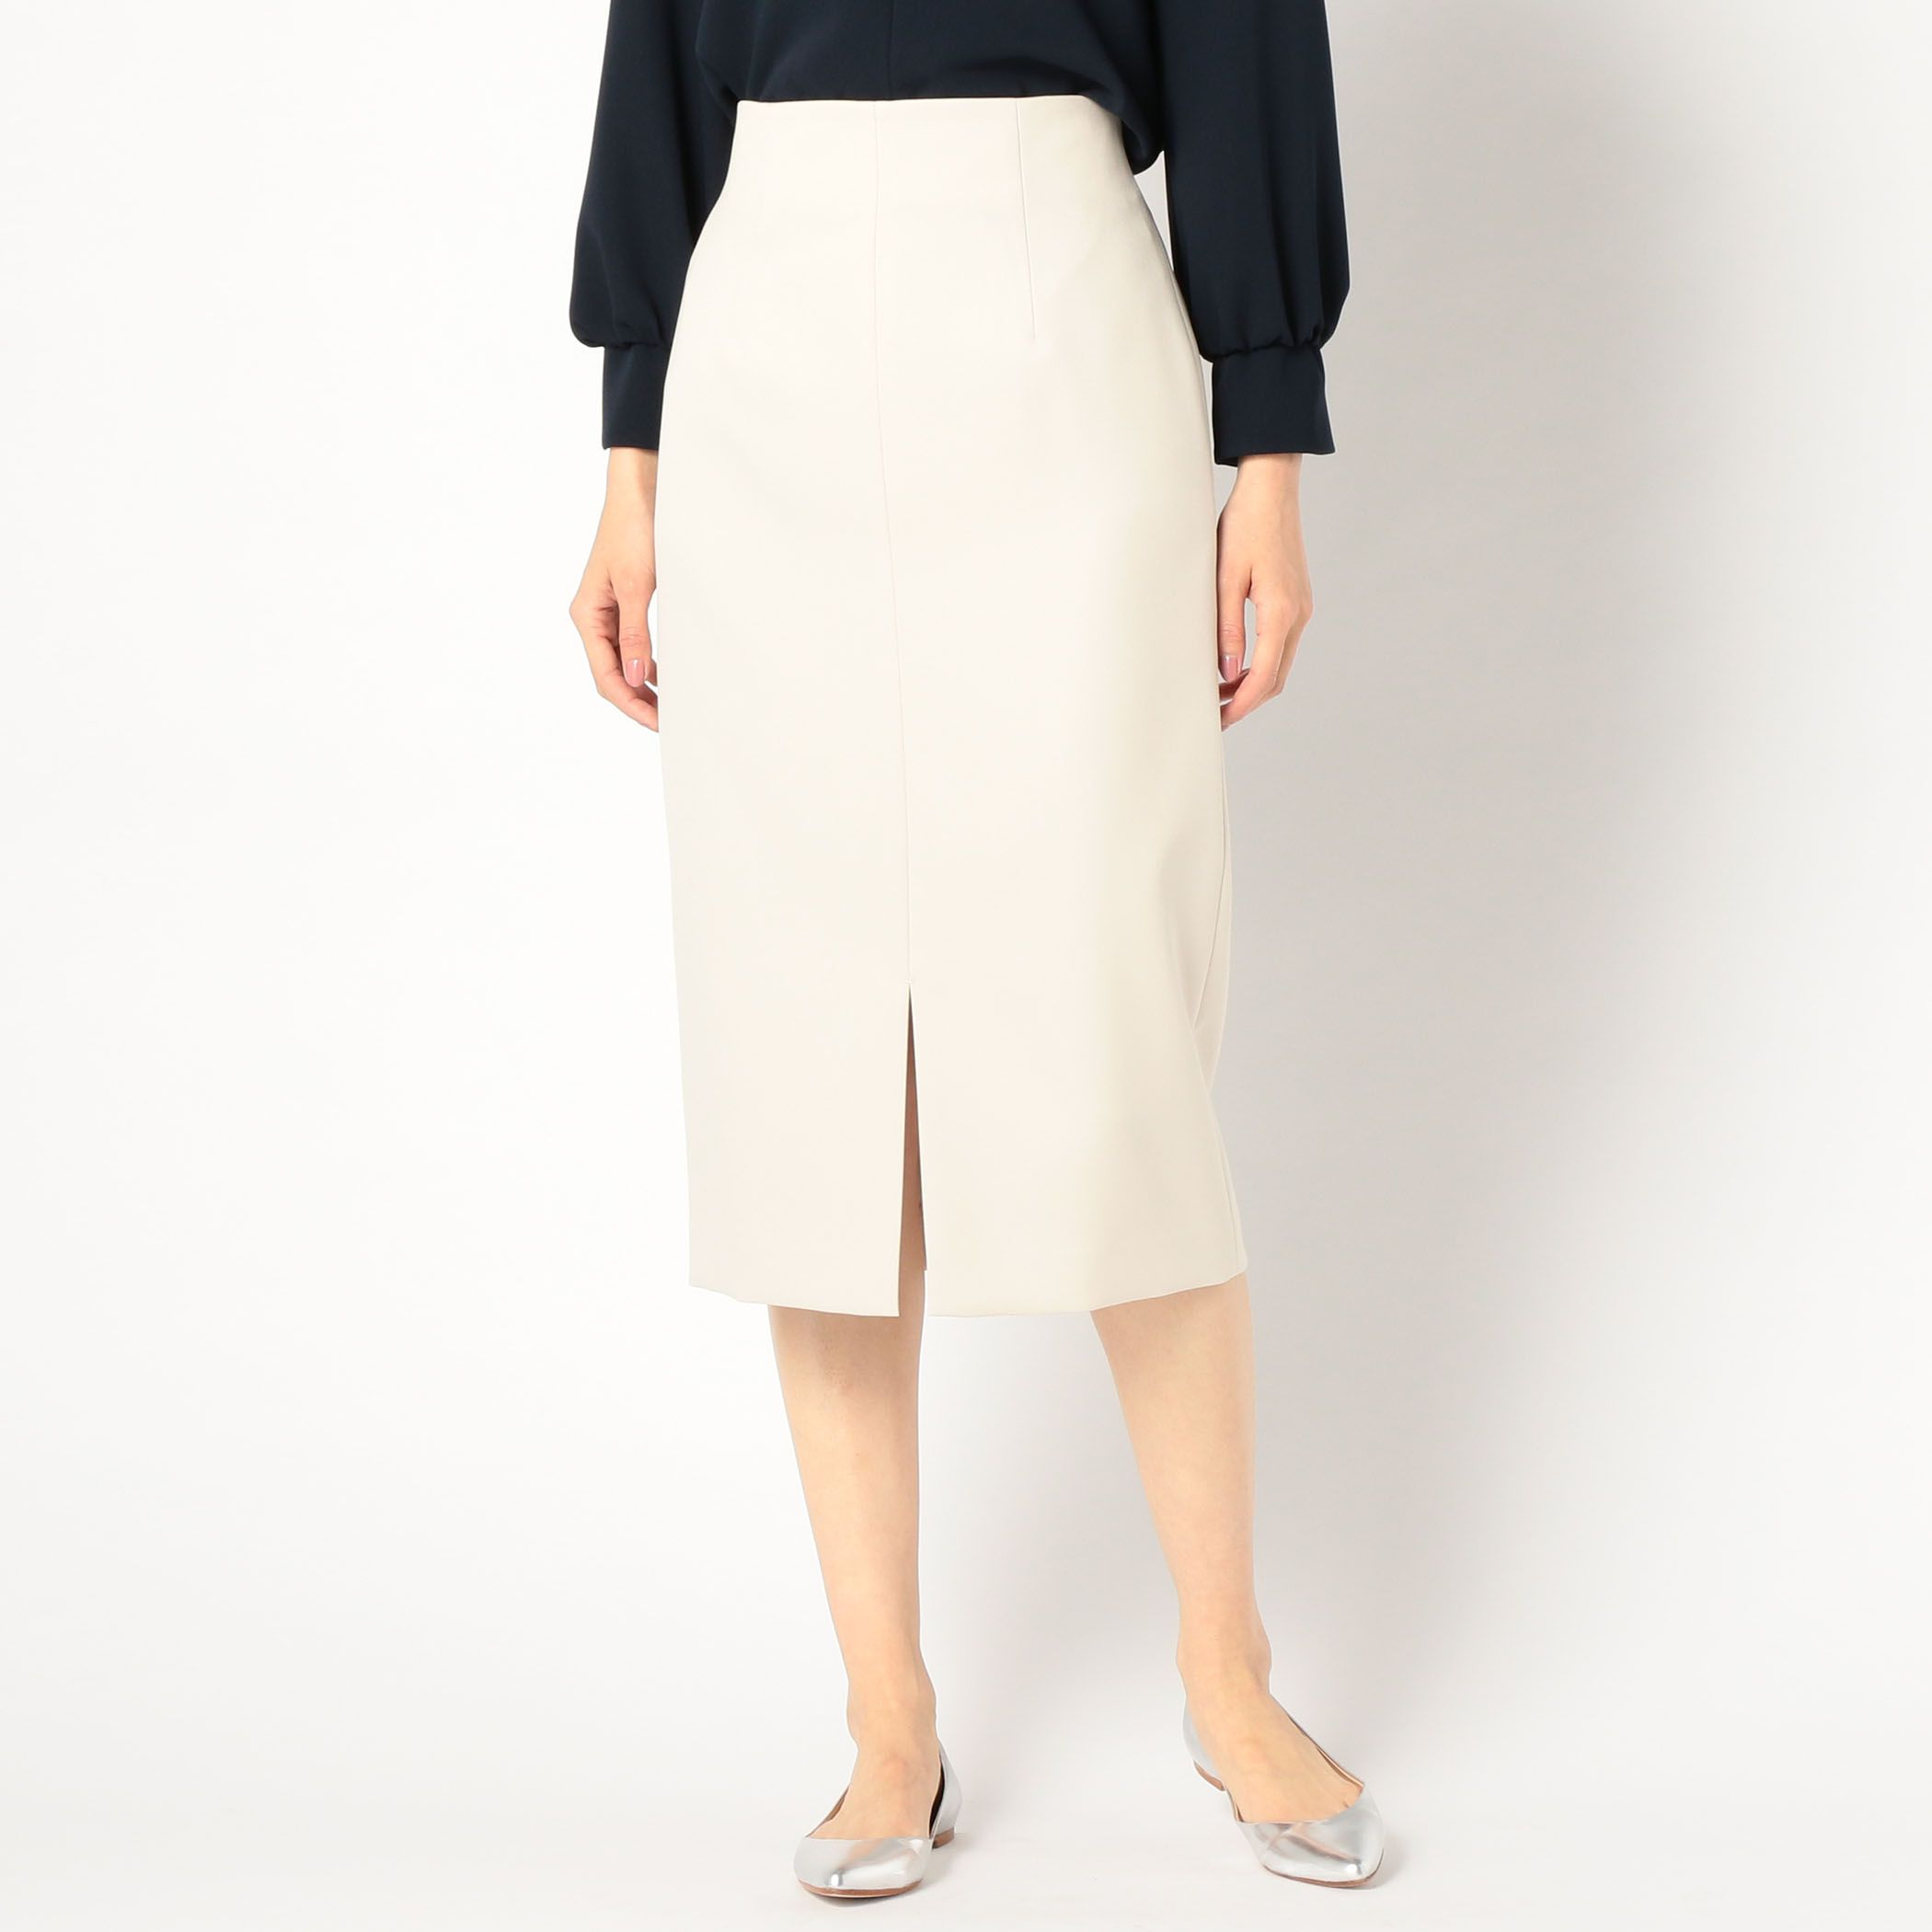 NOLLEY'S sophiノーリーズソフィー/ハイウエストロングタイトスカート